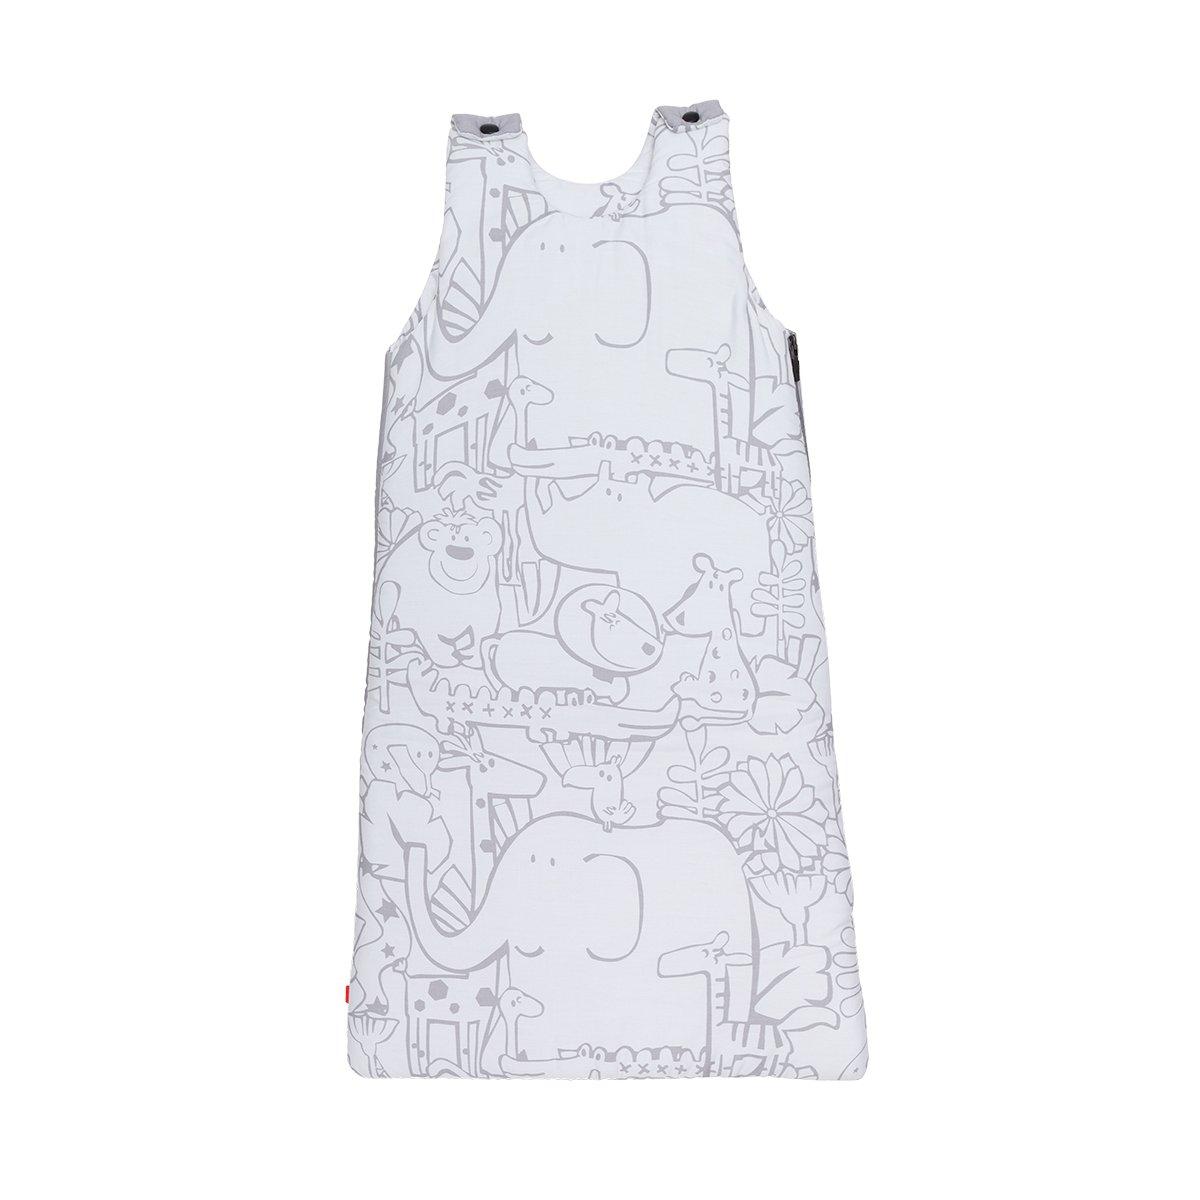 Cambrass Sleeping Bag (90 x 55 cm, Be Range, Zoo Grey) 38142